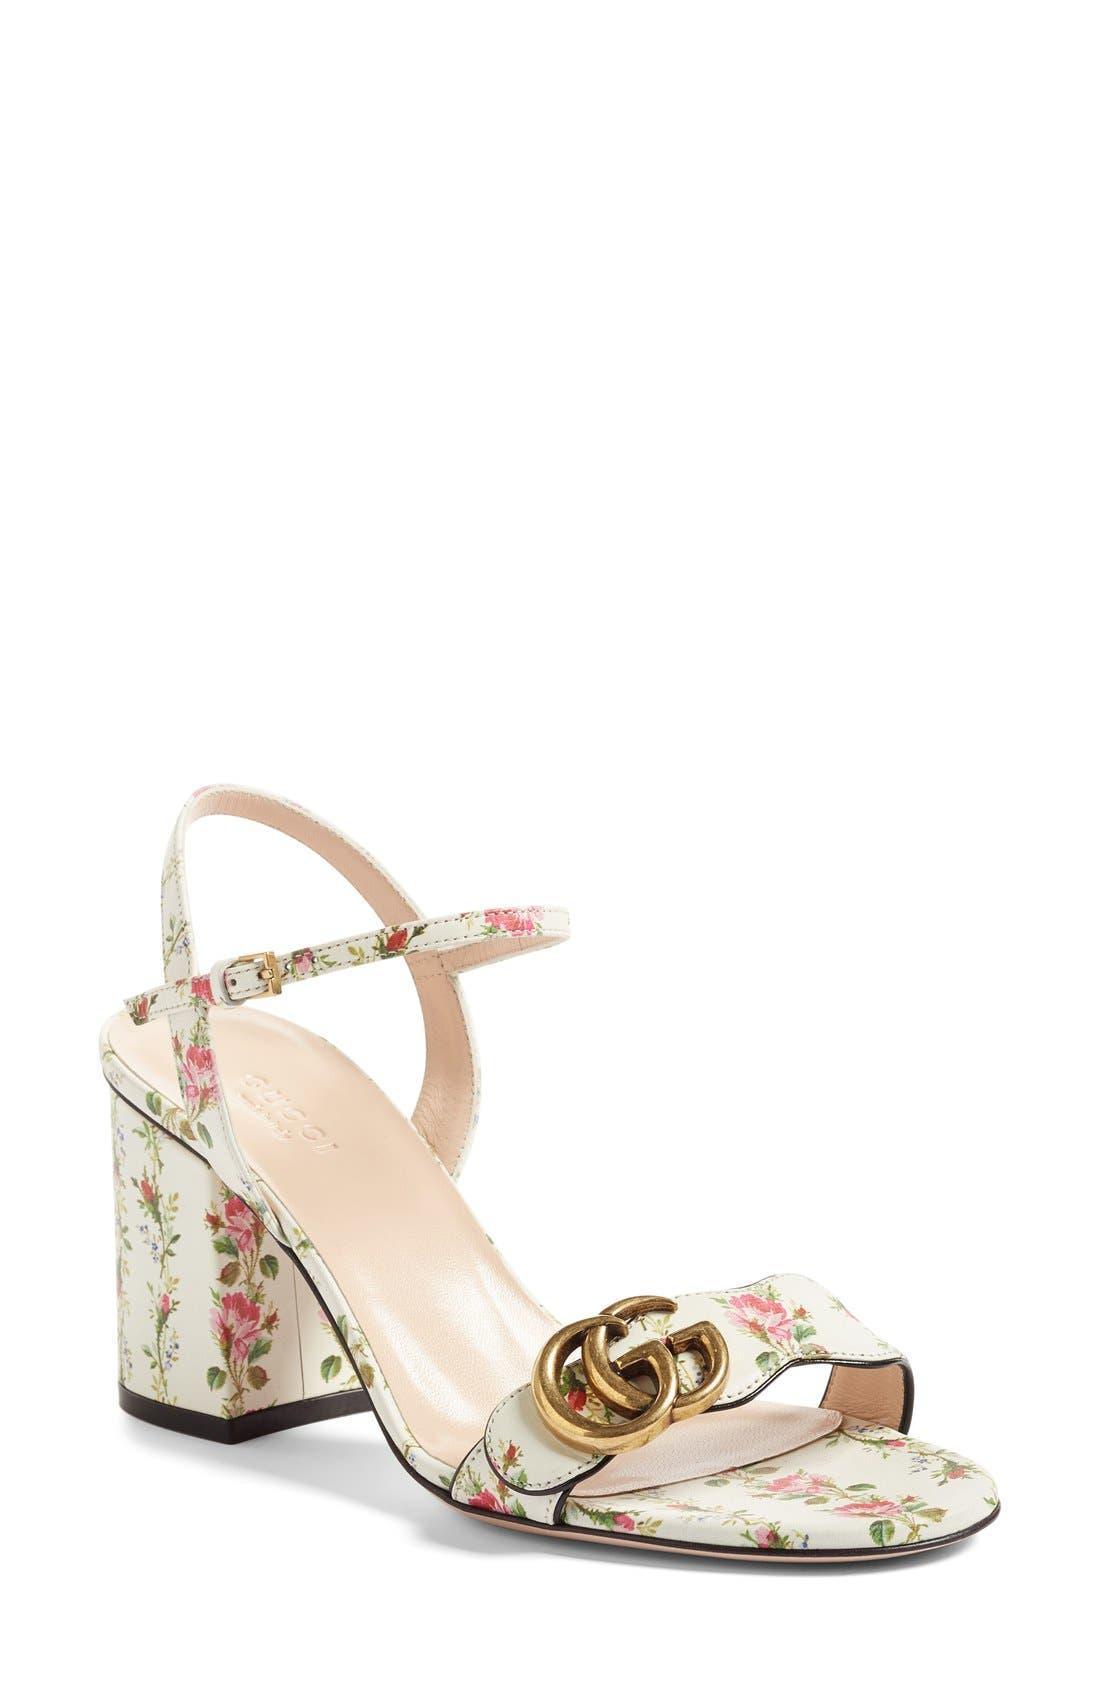 GG Marmont Block Heel Sandal,                             Main thumbnail 1, color,                             White Floral